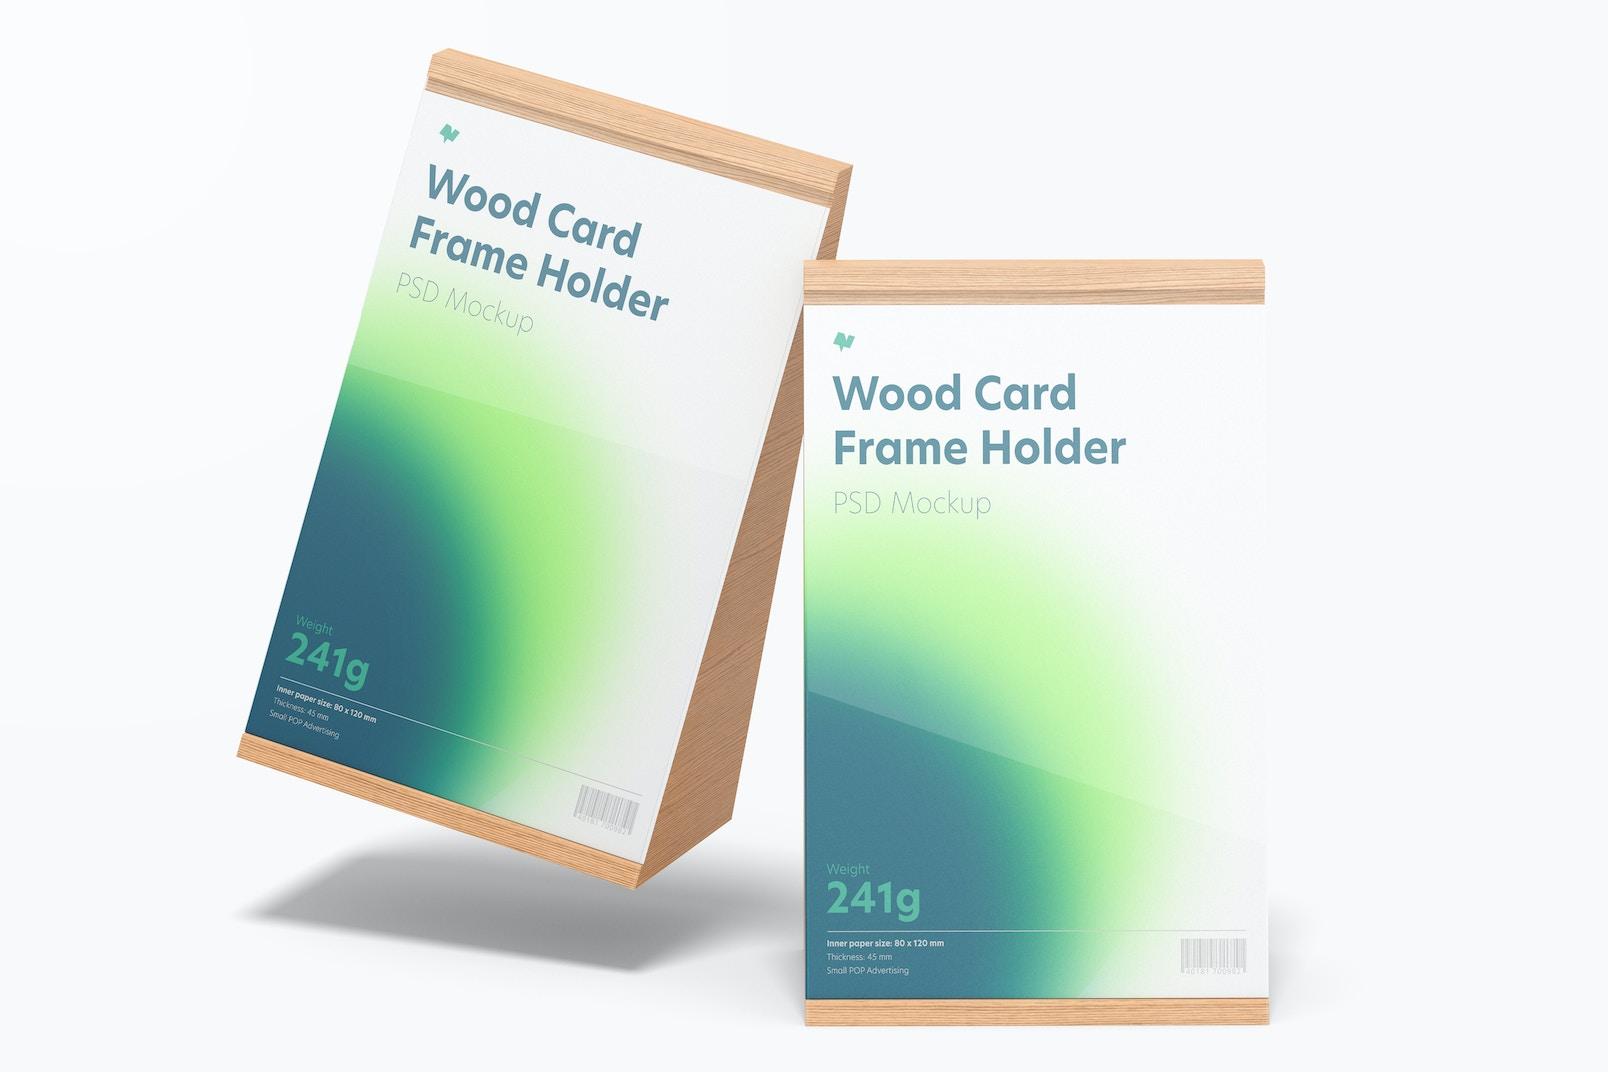 Wood Card Frame Holders Mockup, Falling